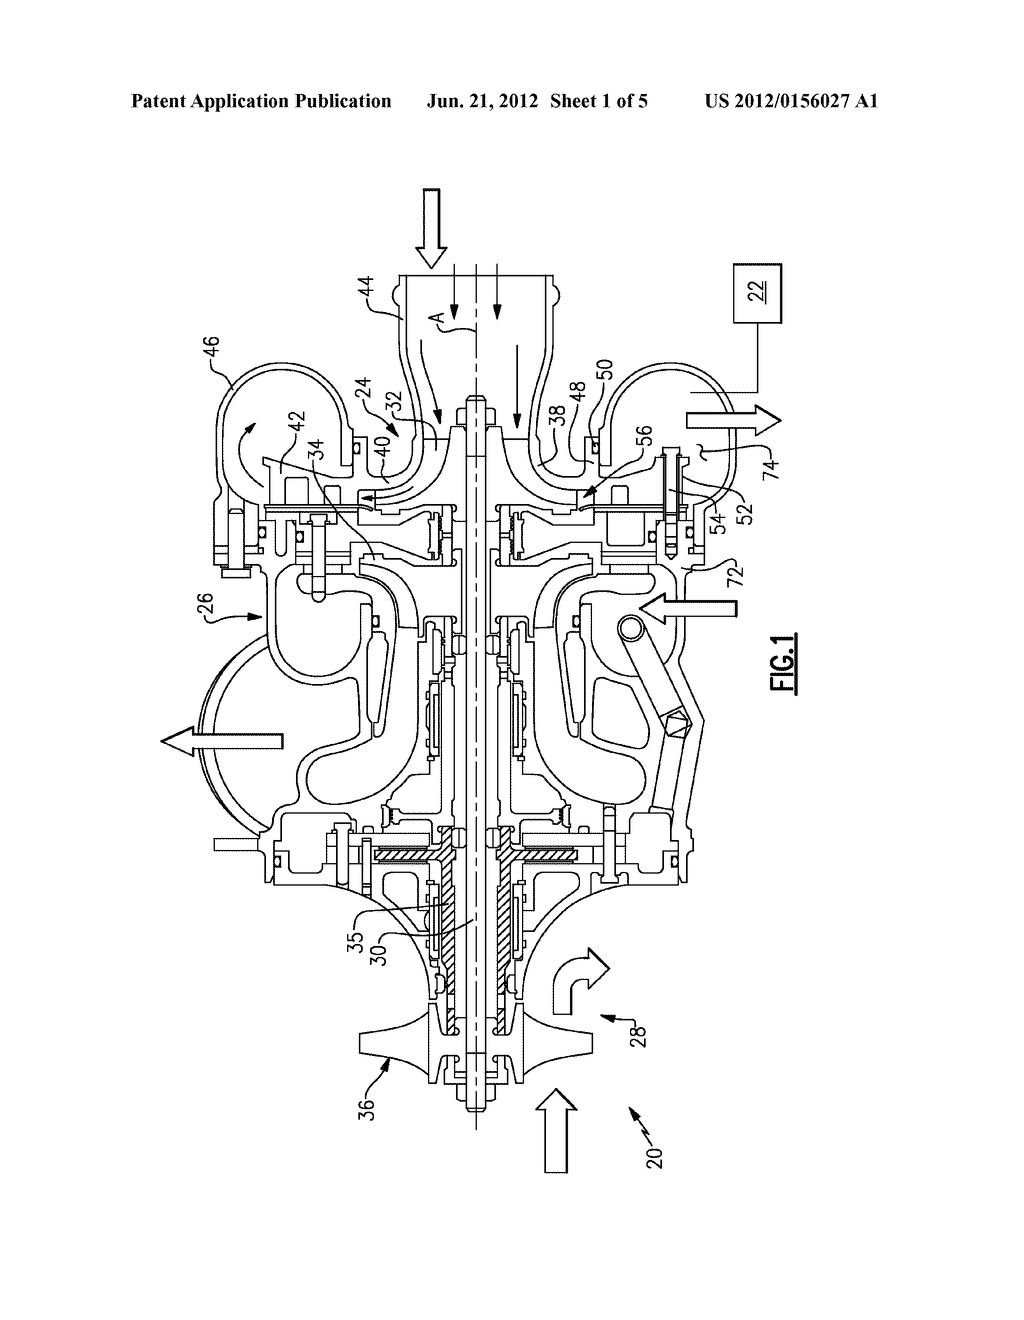 air cycle machine compressor diffuser   diagram  schematic  and imageair cycle machine compressor diffuser   diagram  schematic  and image